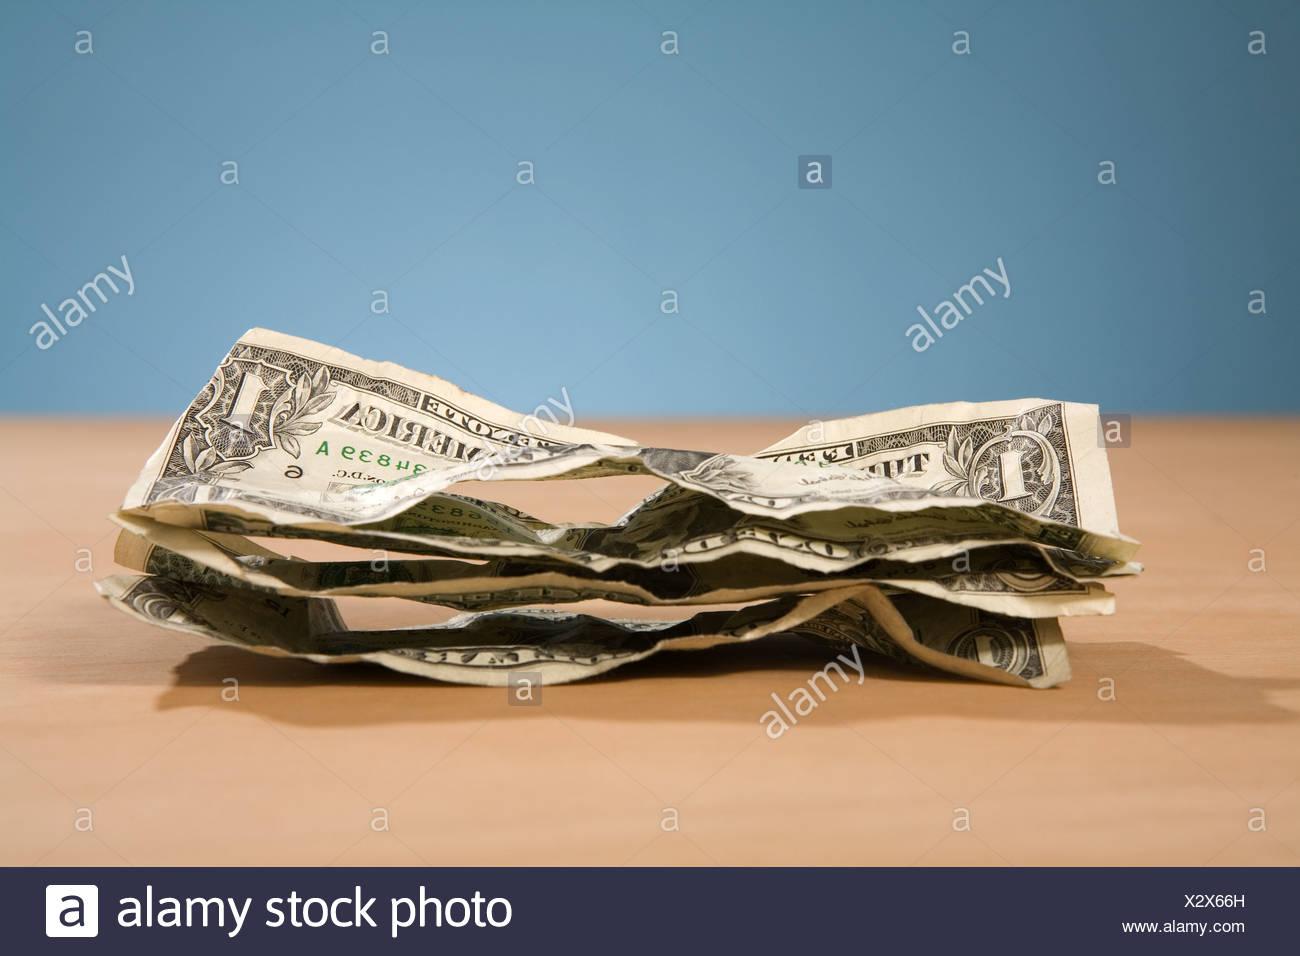 Crumpled Dollar bills - Stock Image